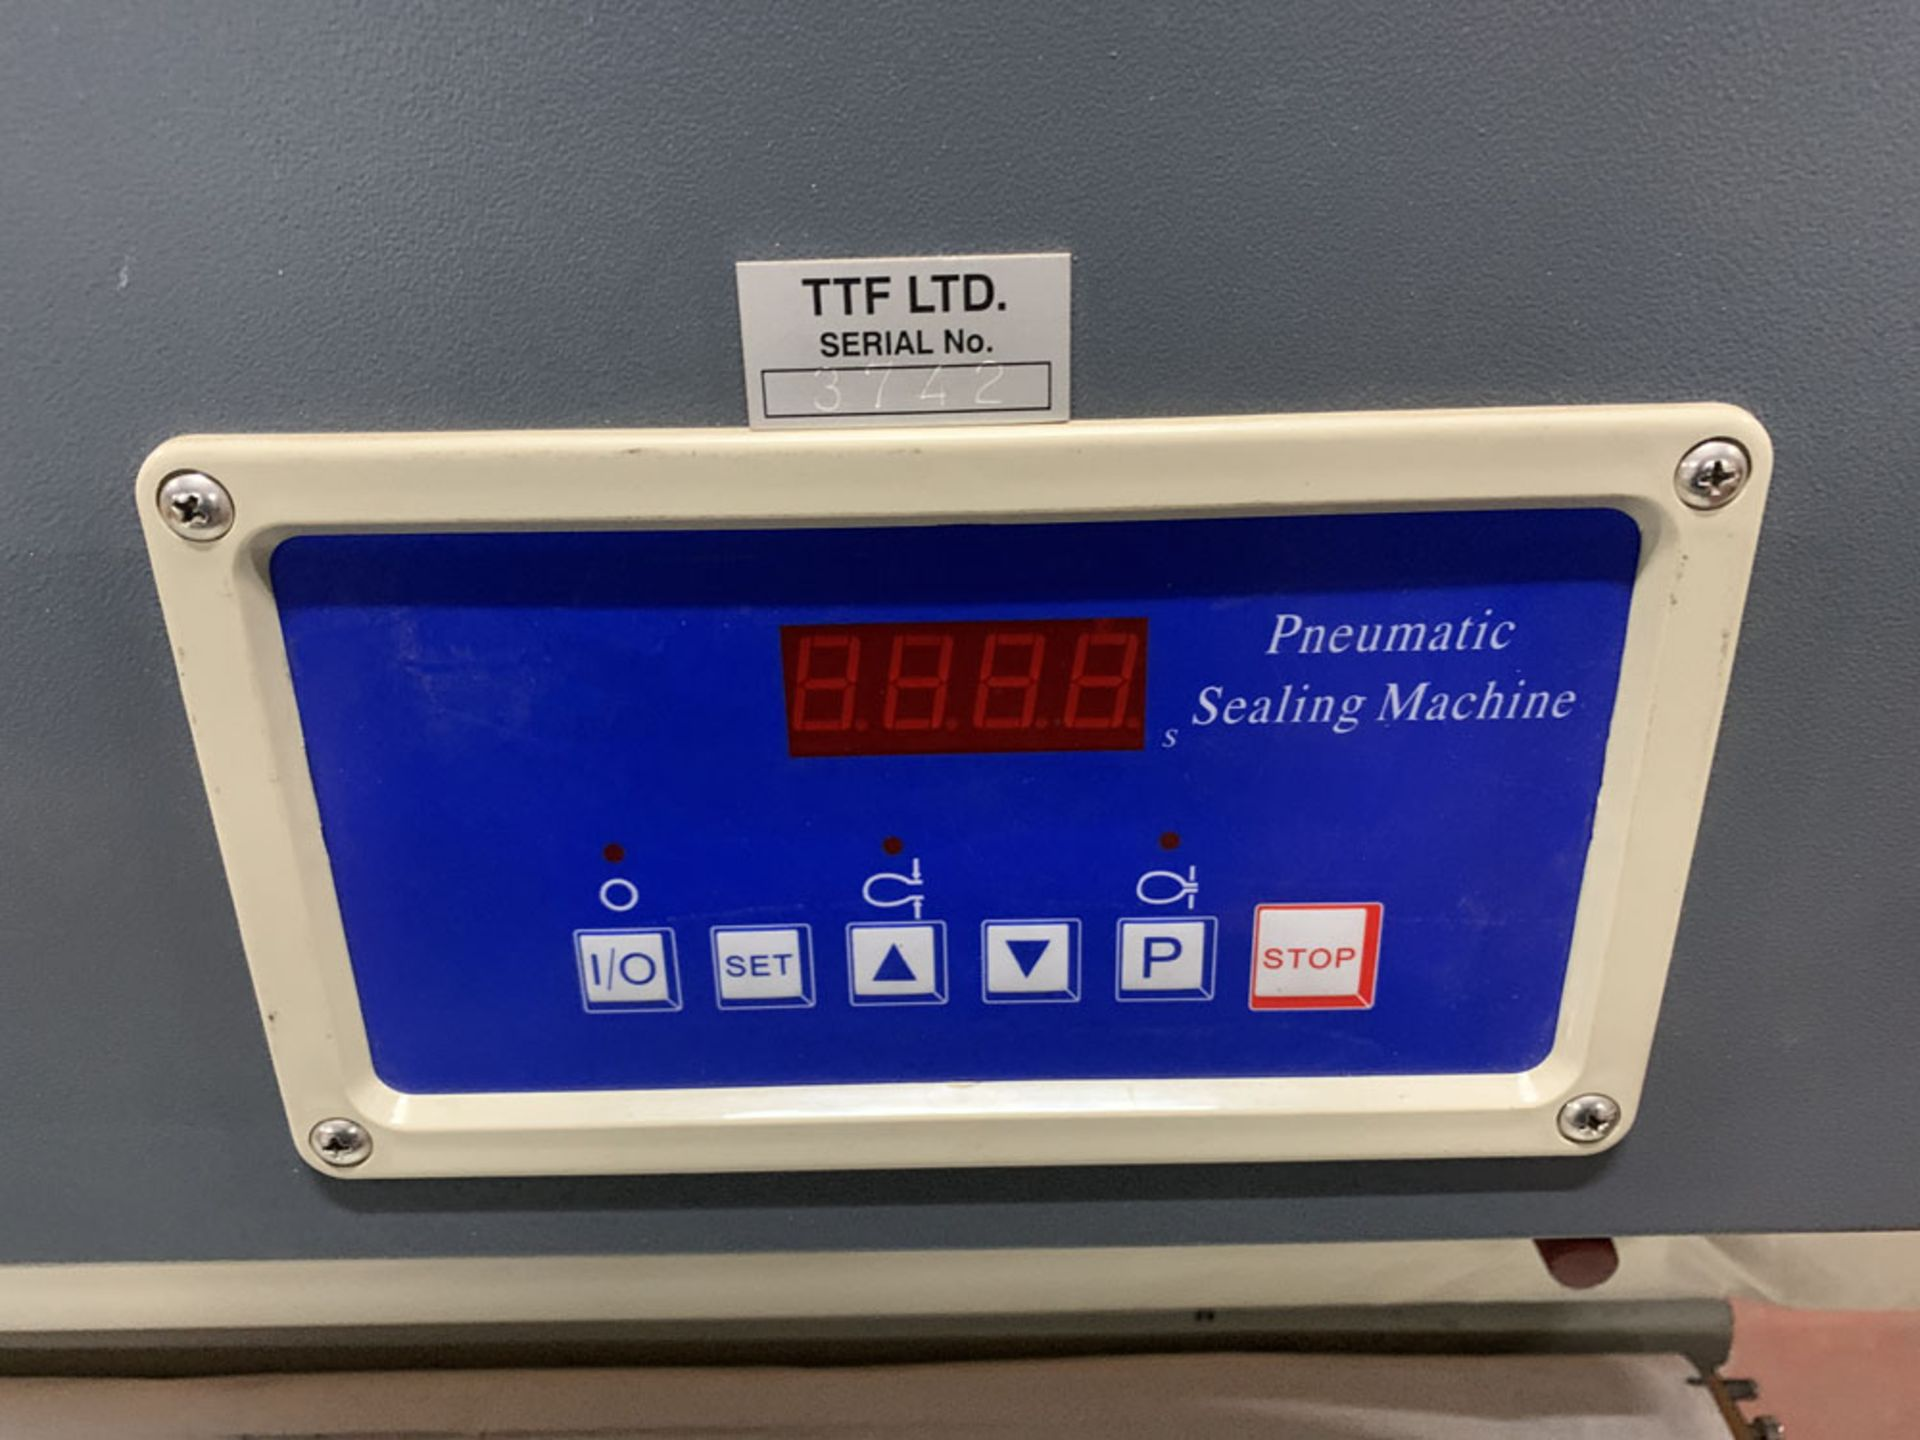 Lot 15 - TTF Ltd Model FMQP Pneumatic Sealing Machine. Single Phase. Year 2013.